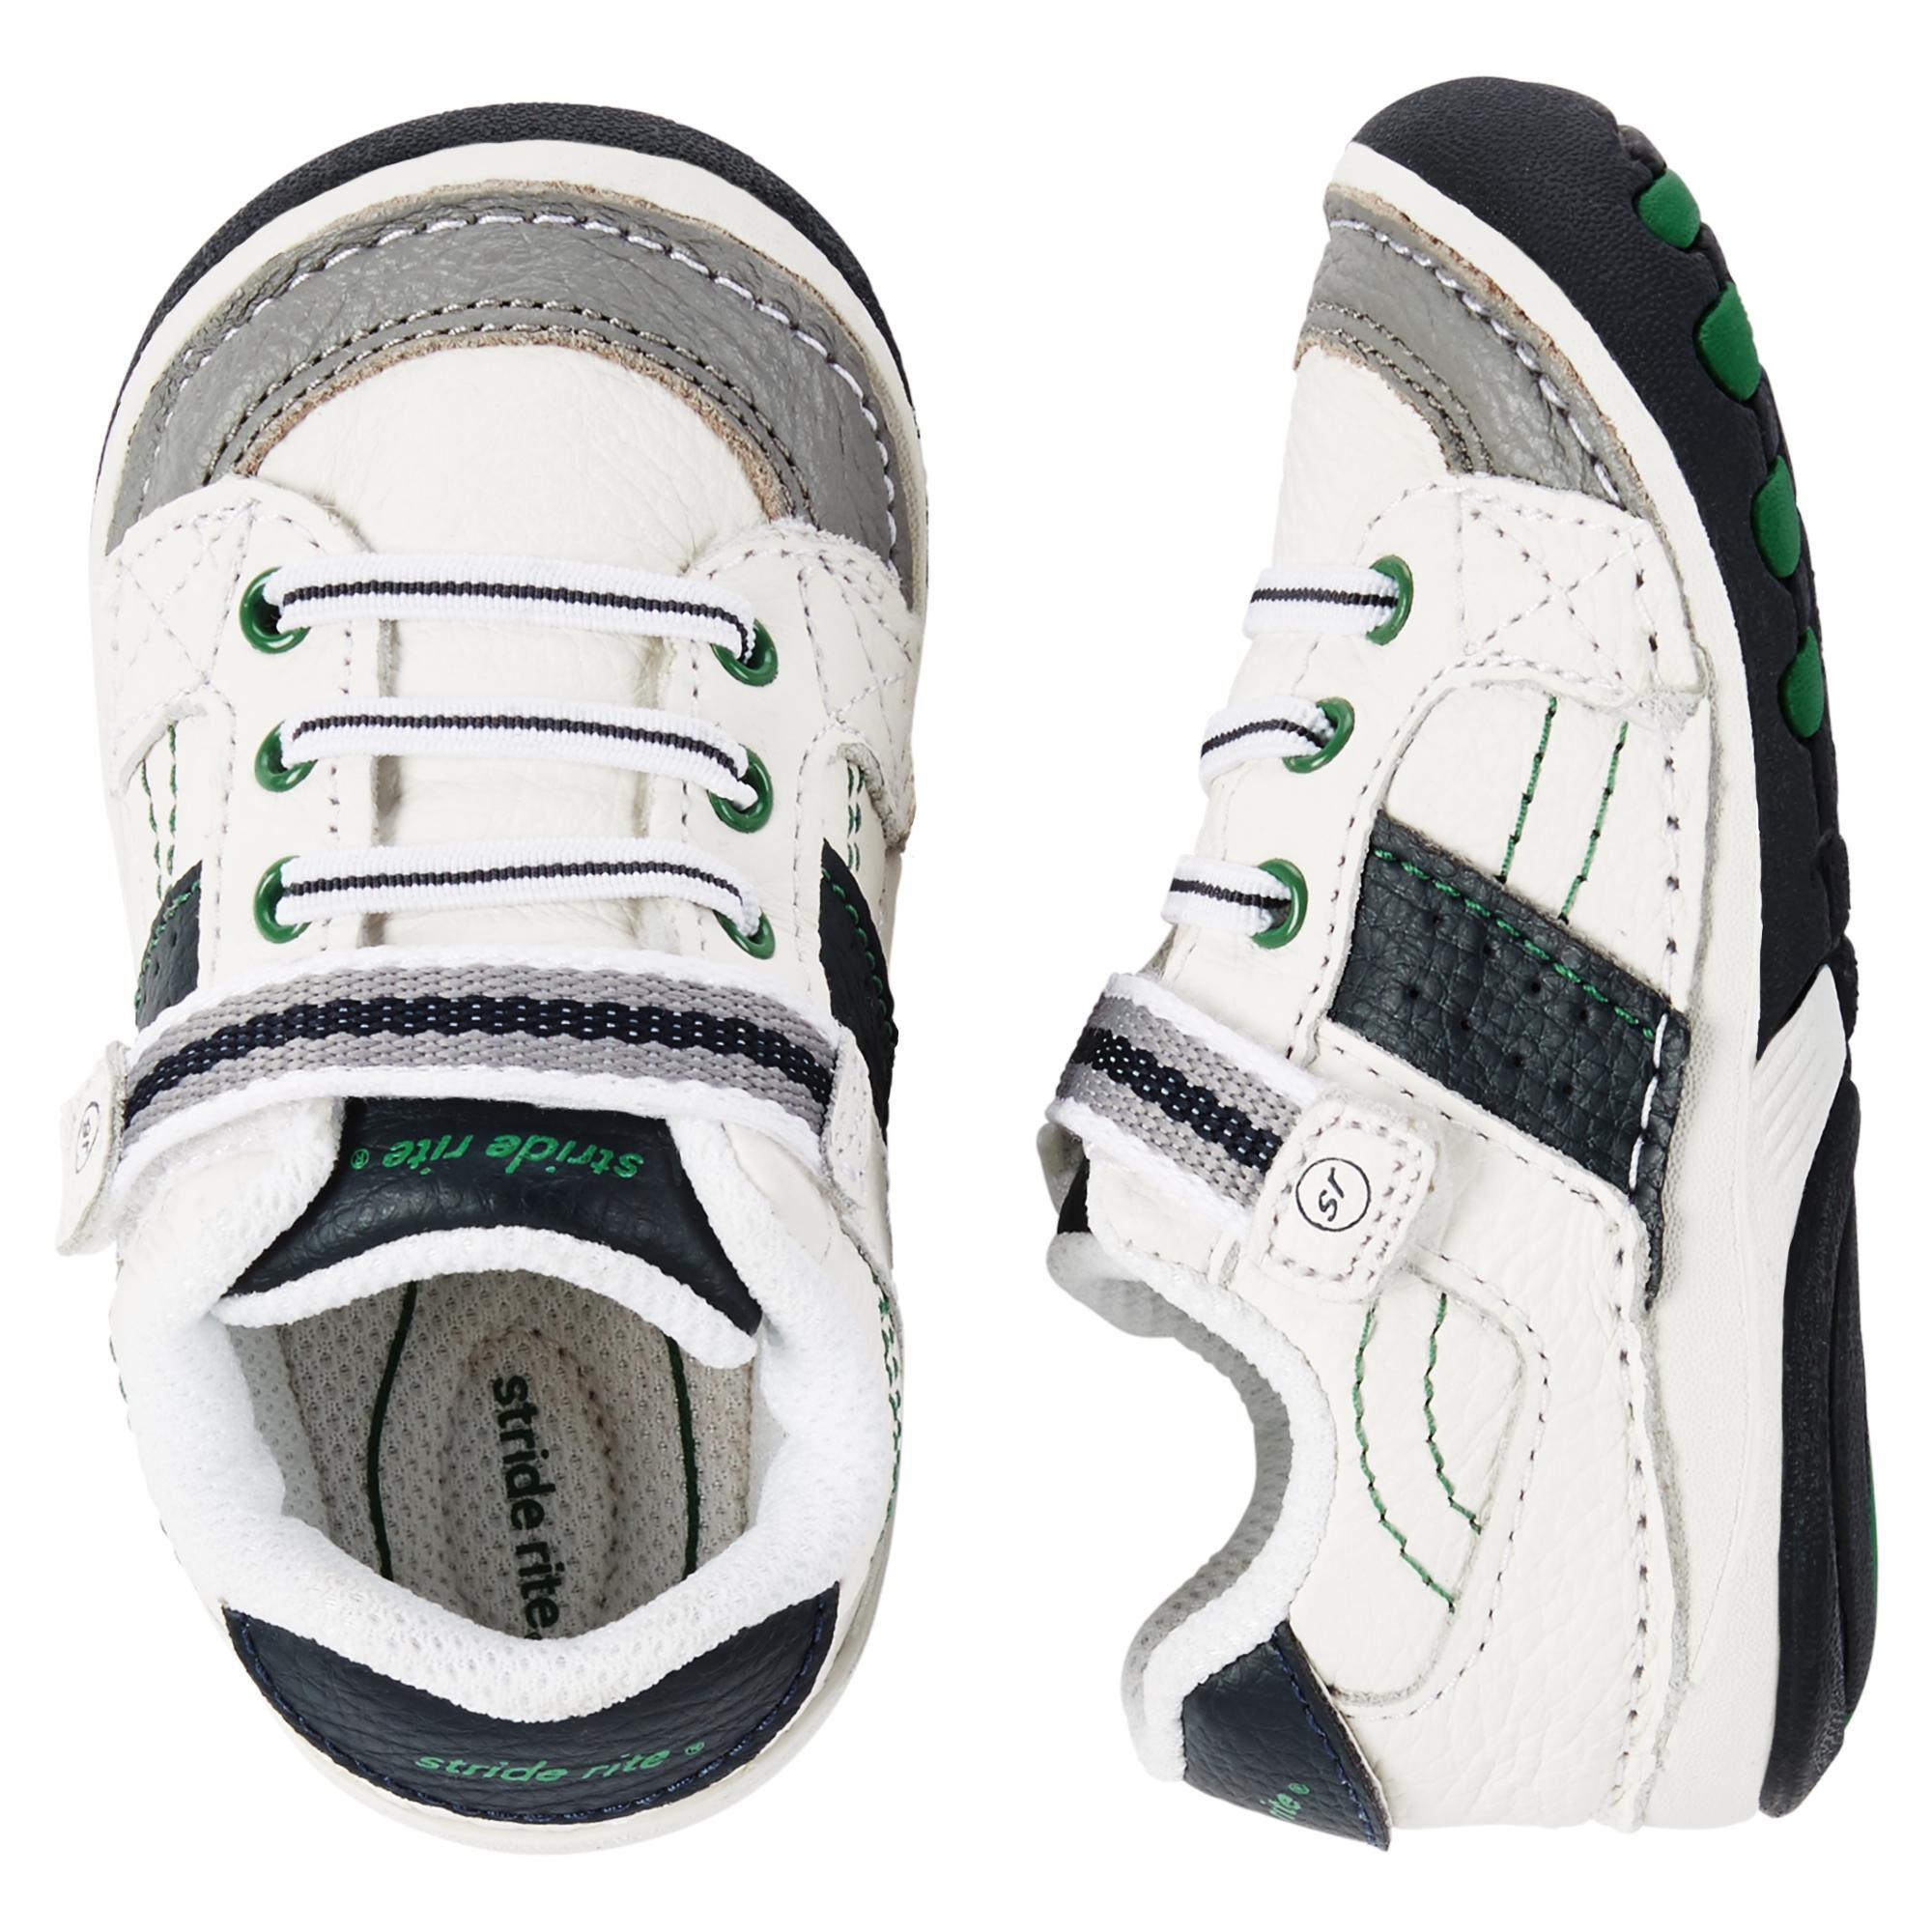 Stride Rite Soft Motion Artie Shoes